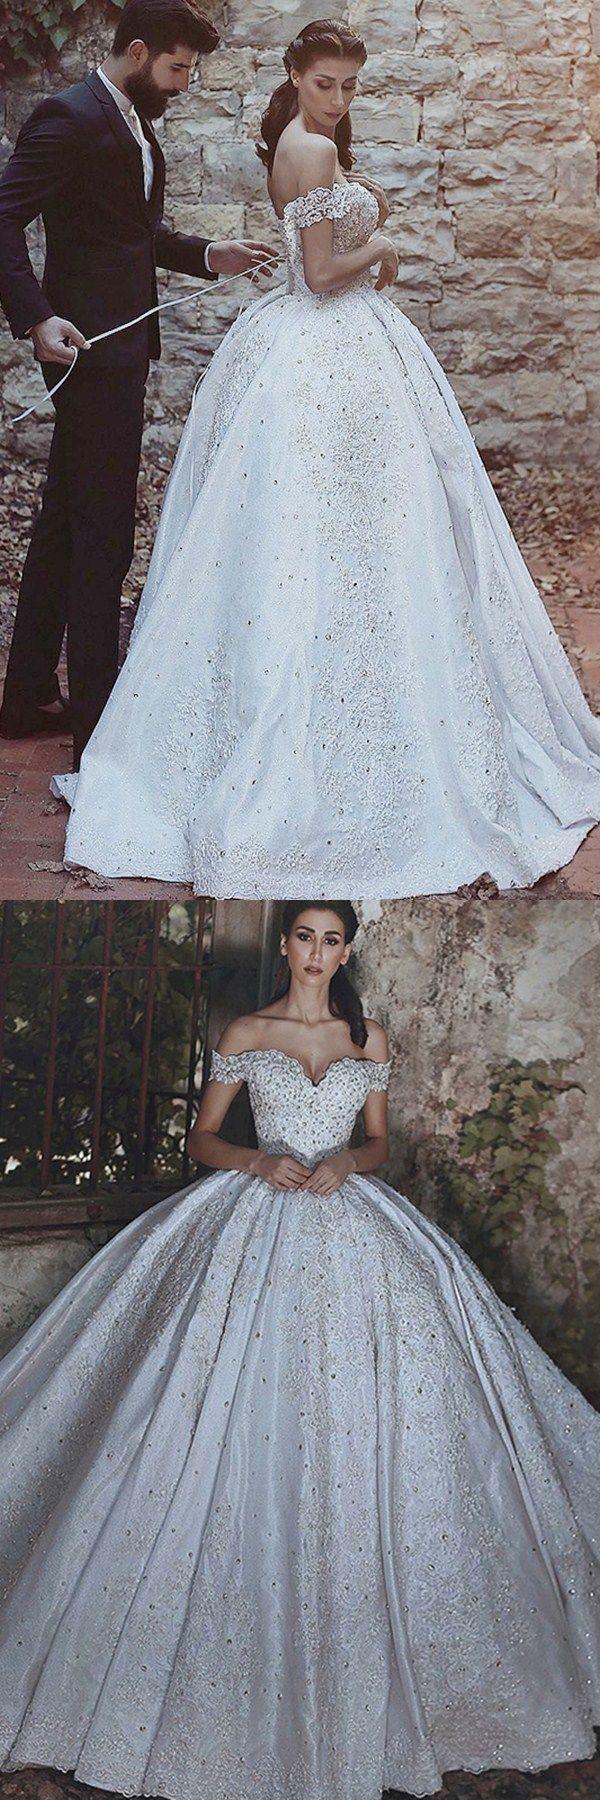 5568 best Wedding dresses images on Pinterest | Wedding frocks ...